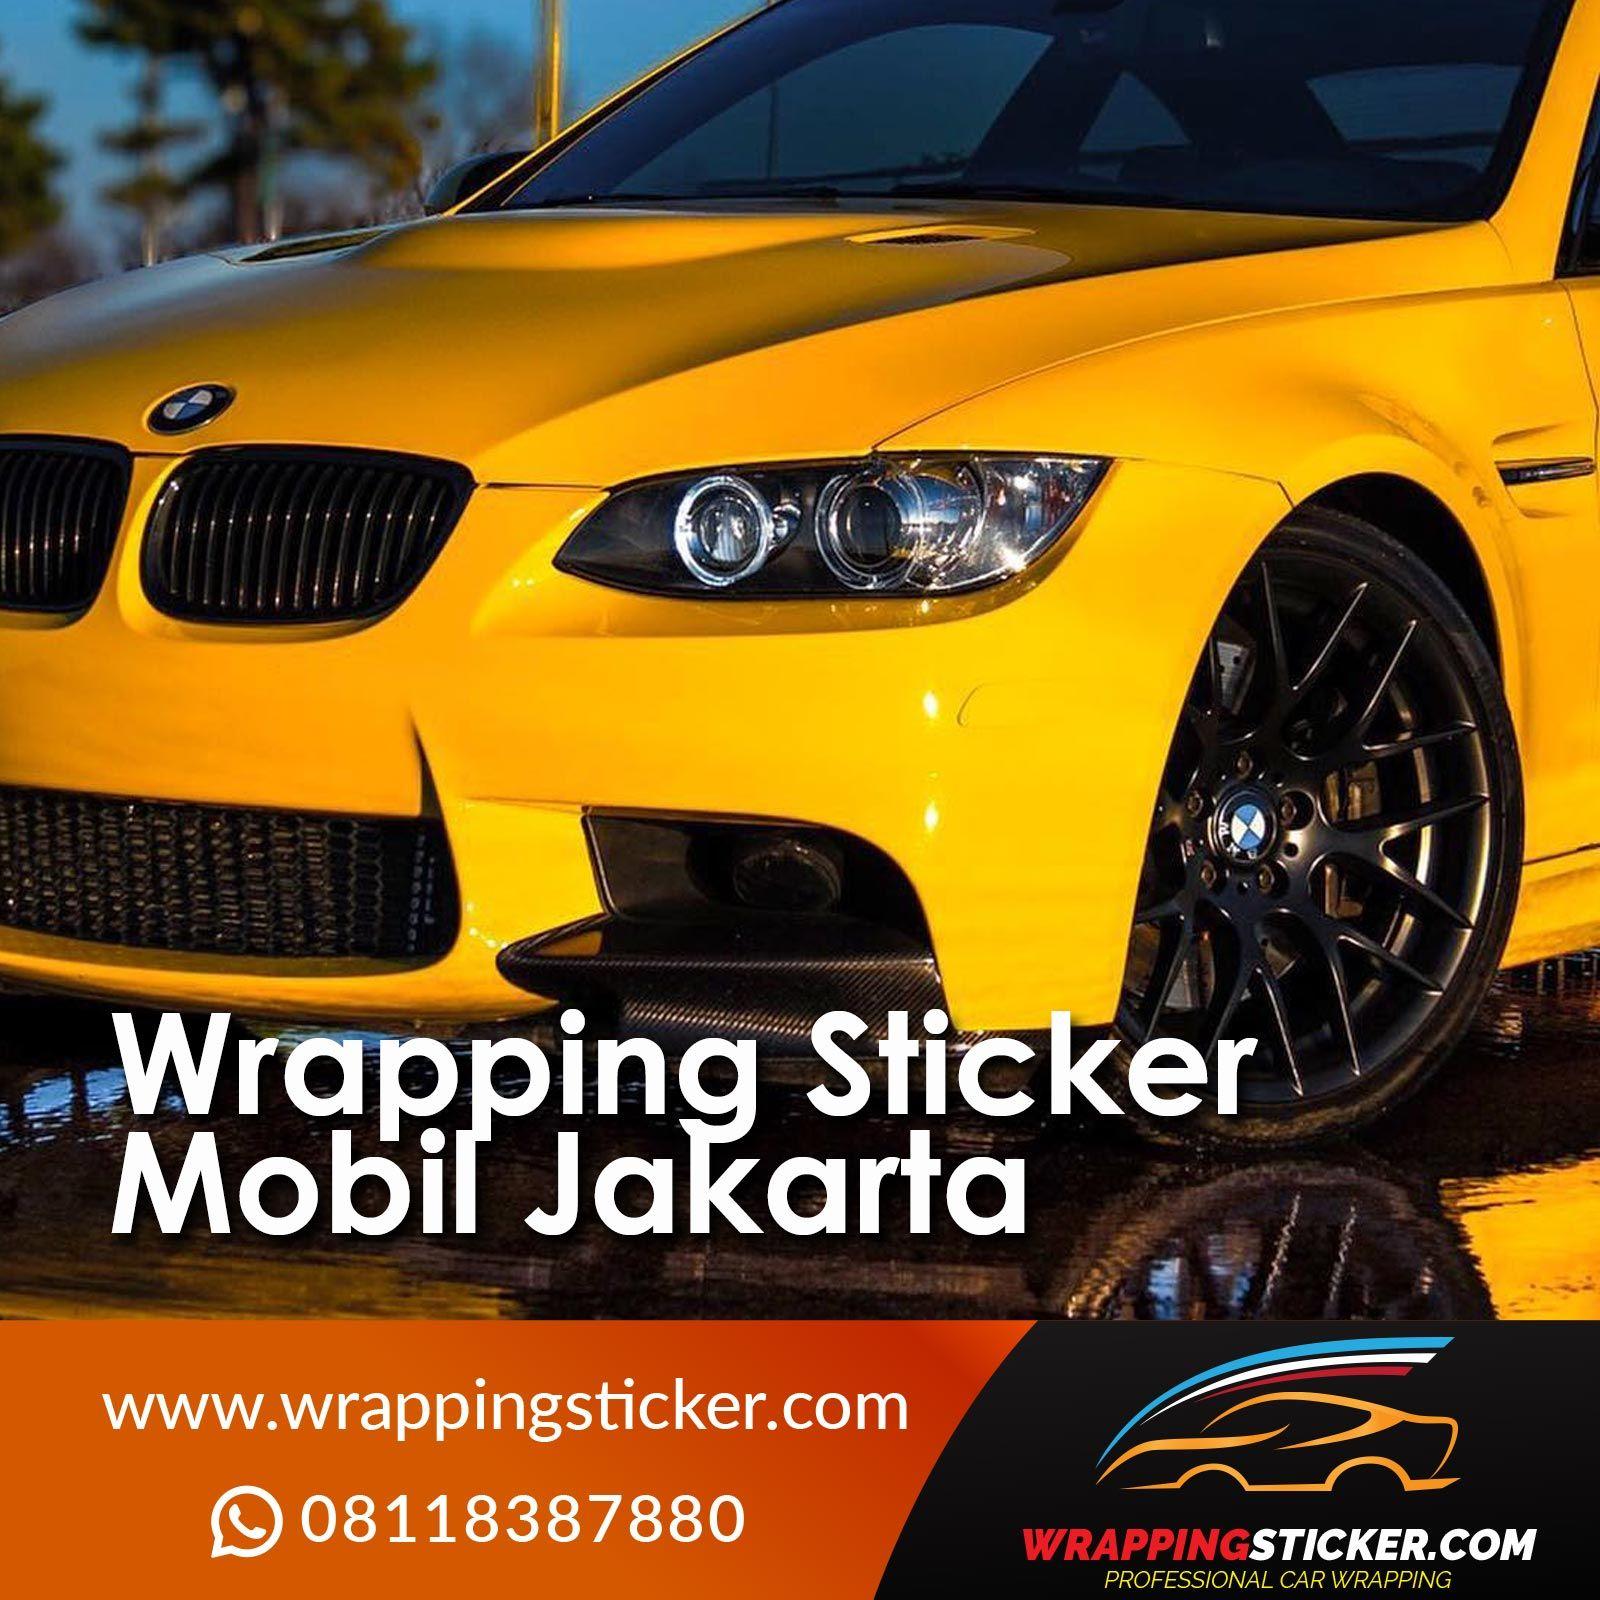 Wrapping Sticker Mobil Jakarta